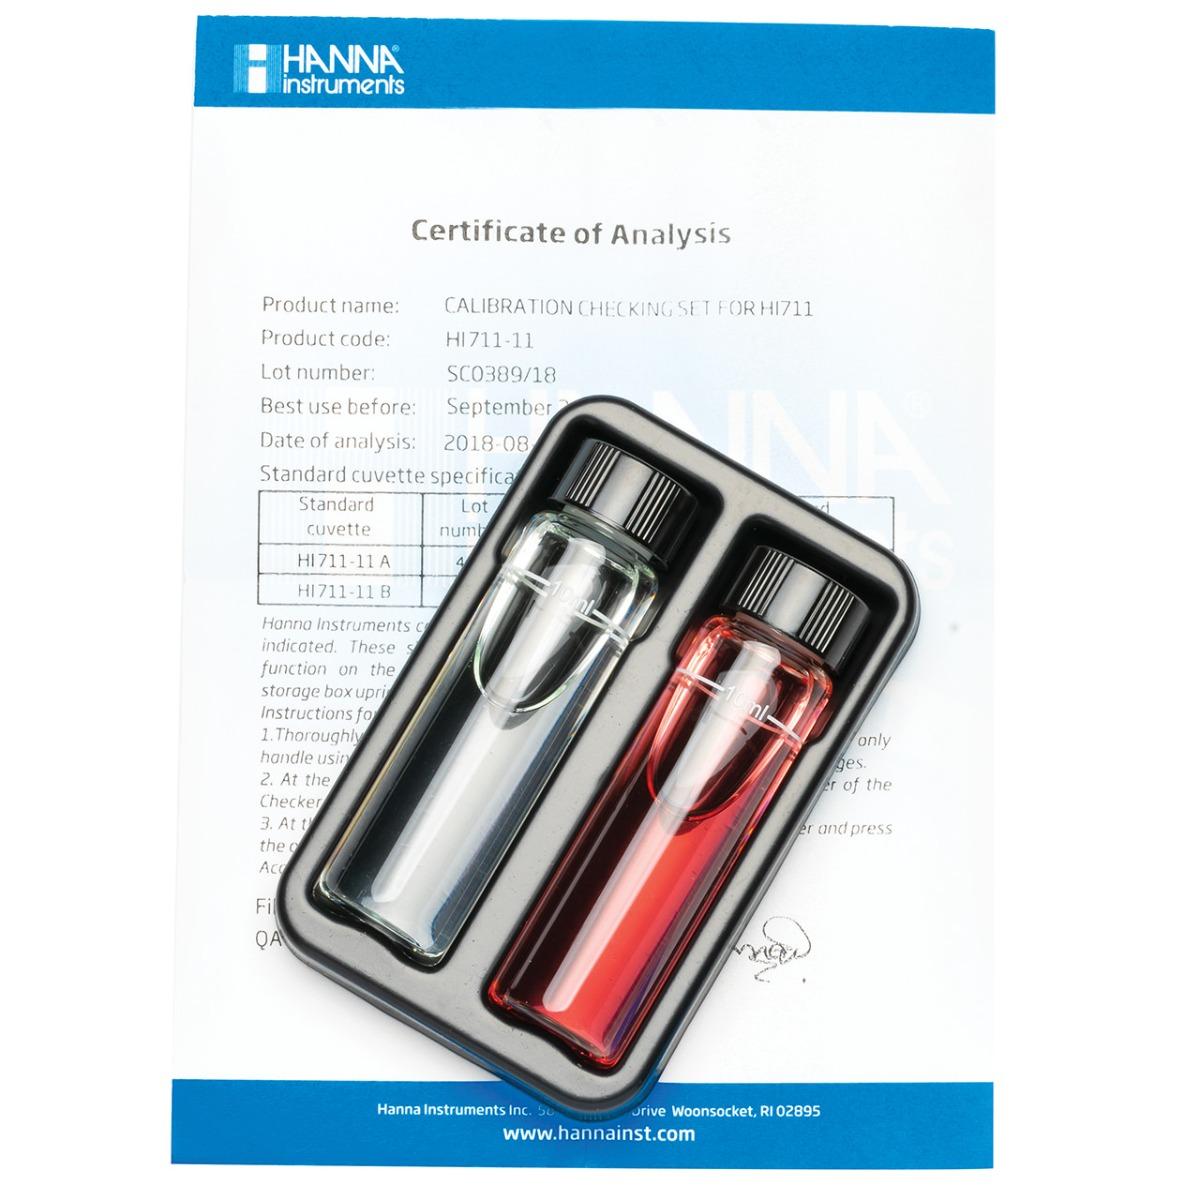 HI711-11 Total Chlorine Checker®HC Calibration Set